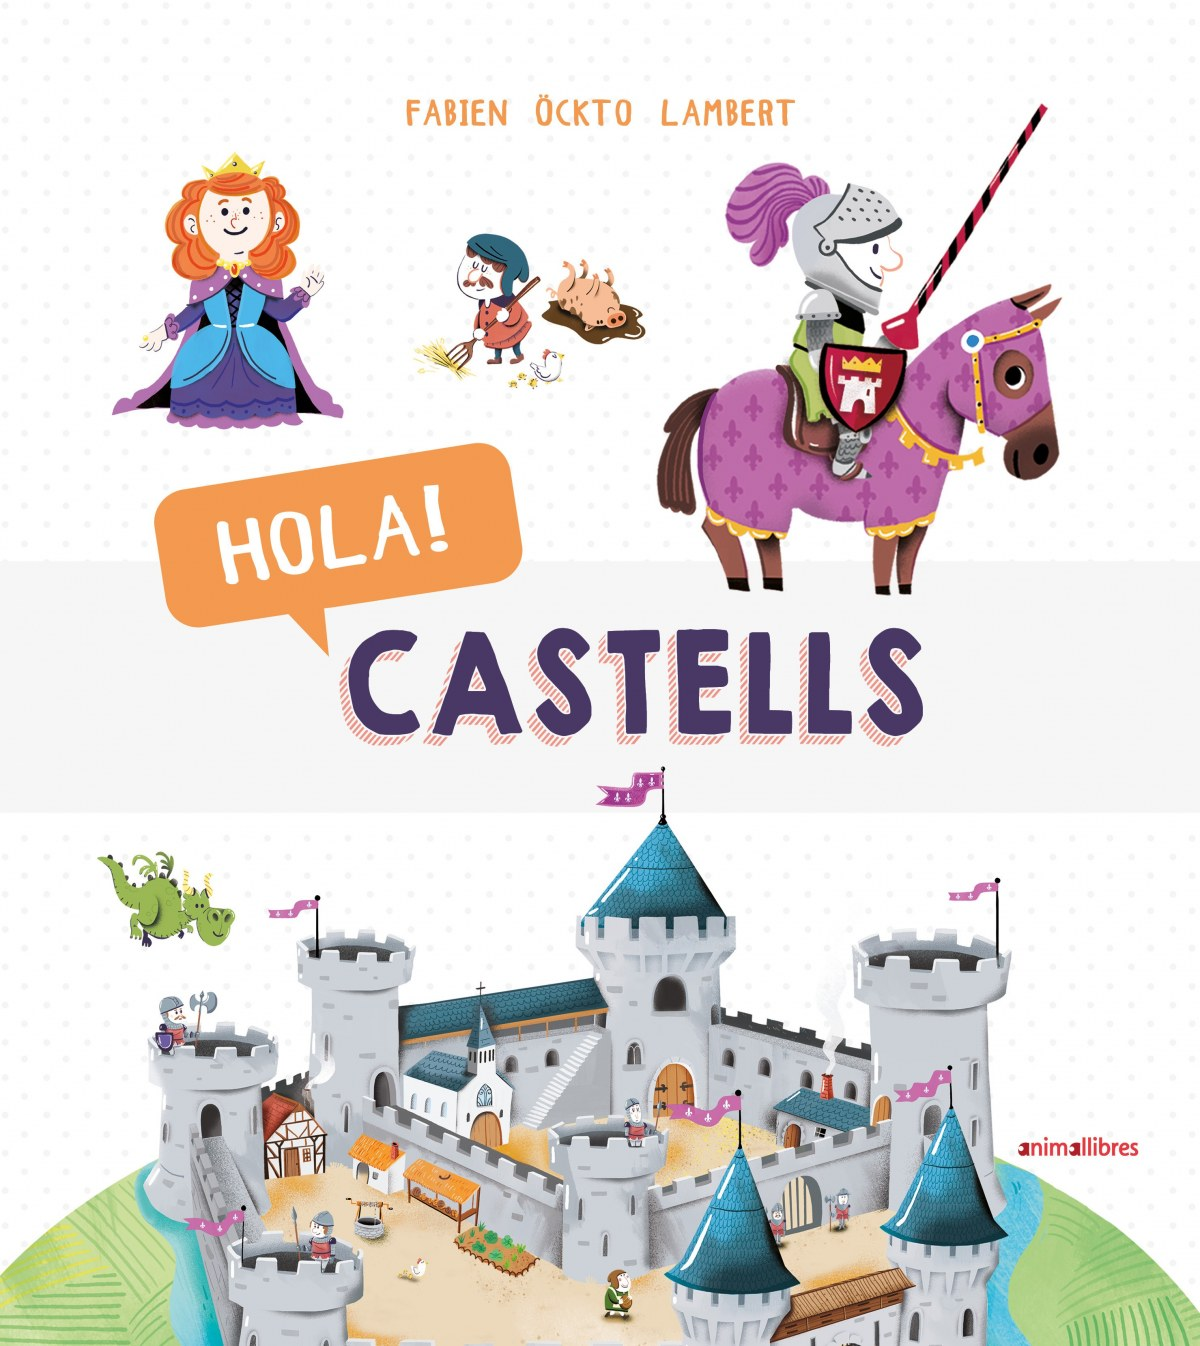 HOLA! CASTELS